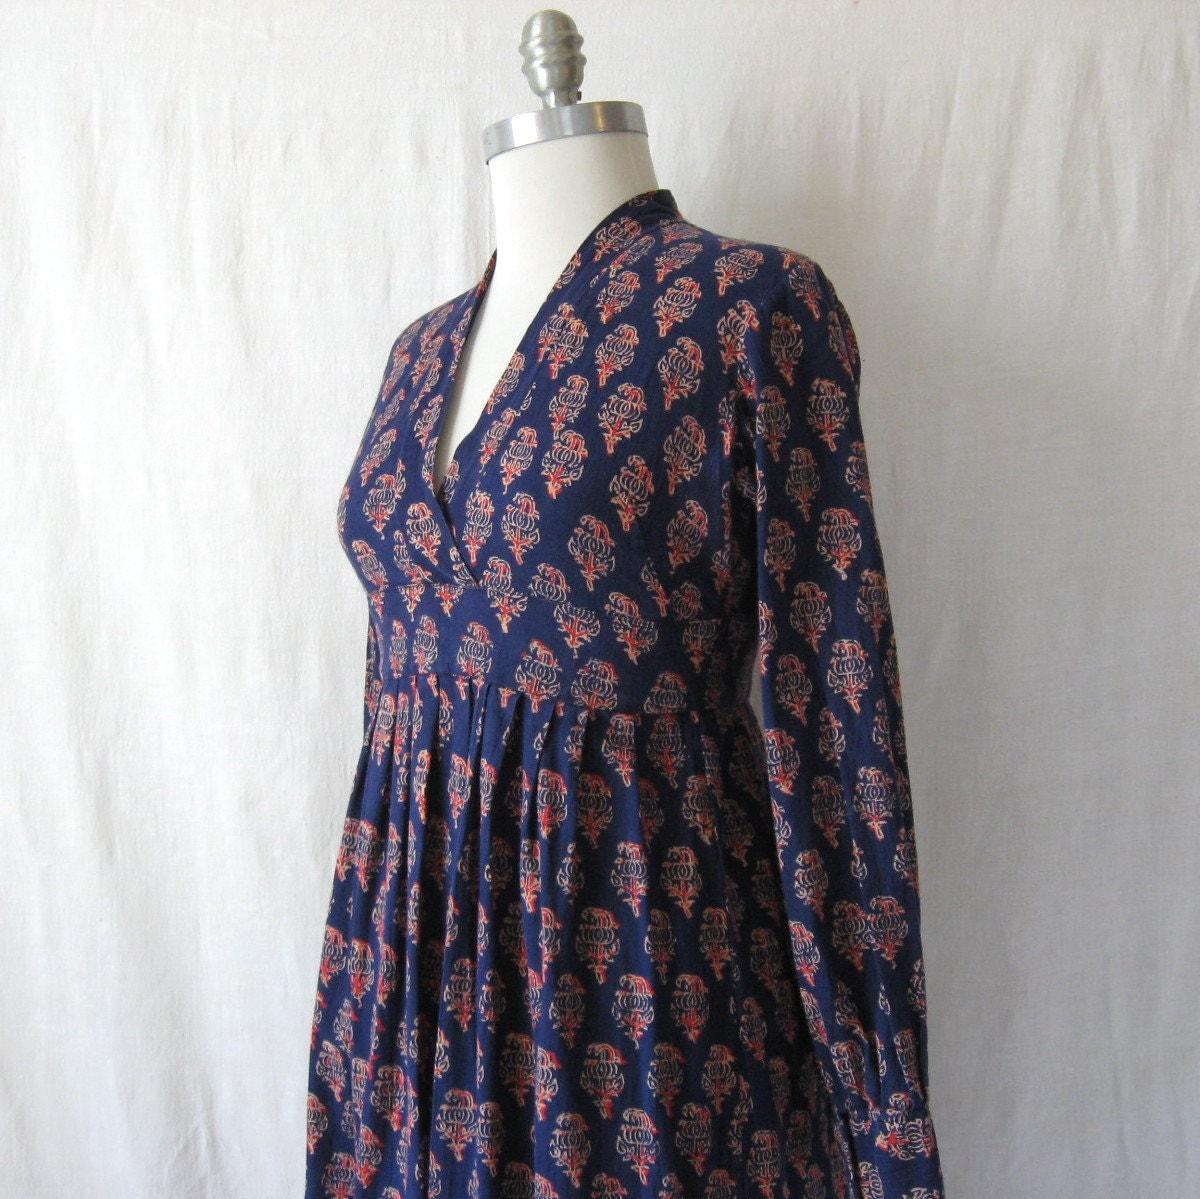 Vintage Indian Dress Bohemian Floral Block Print Maxi 60s 70s